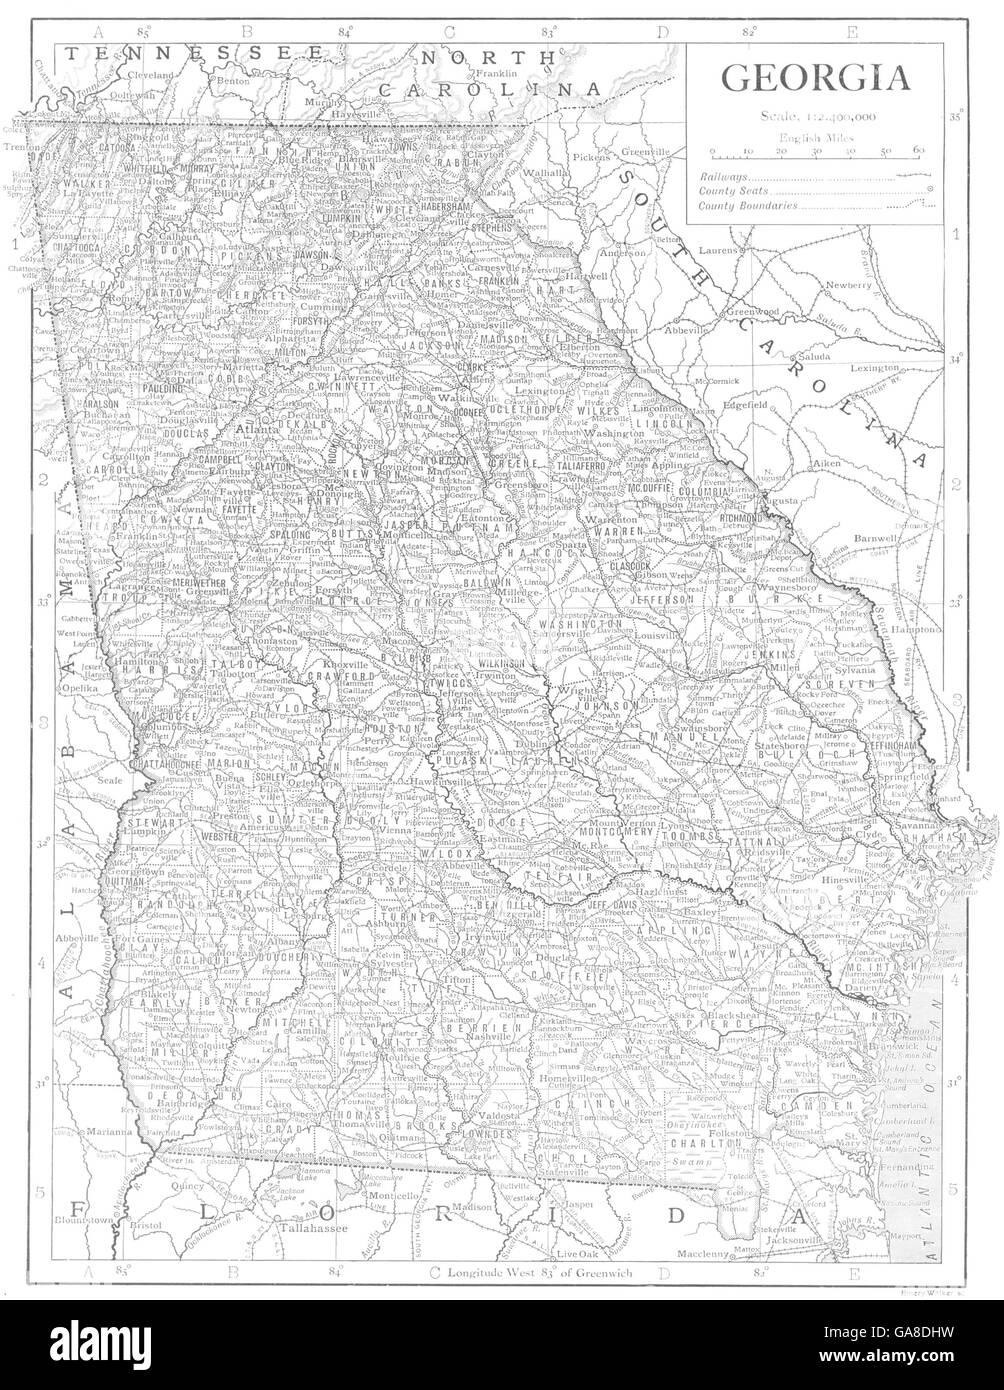 Map Of Georgia Usa Counties.Georgia Usa State Map Showing Counties 1910 Stock Photo 109595077